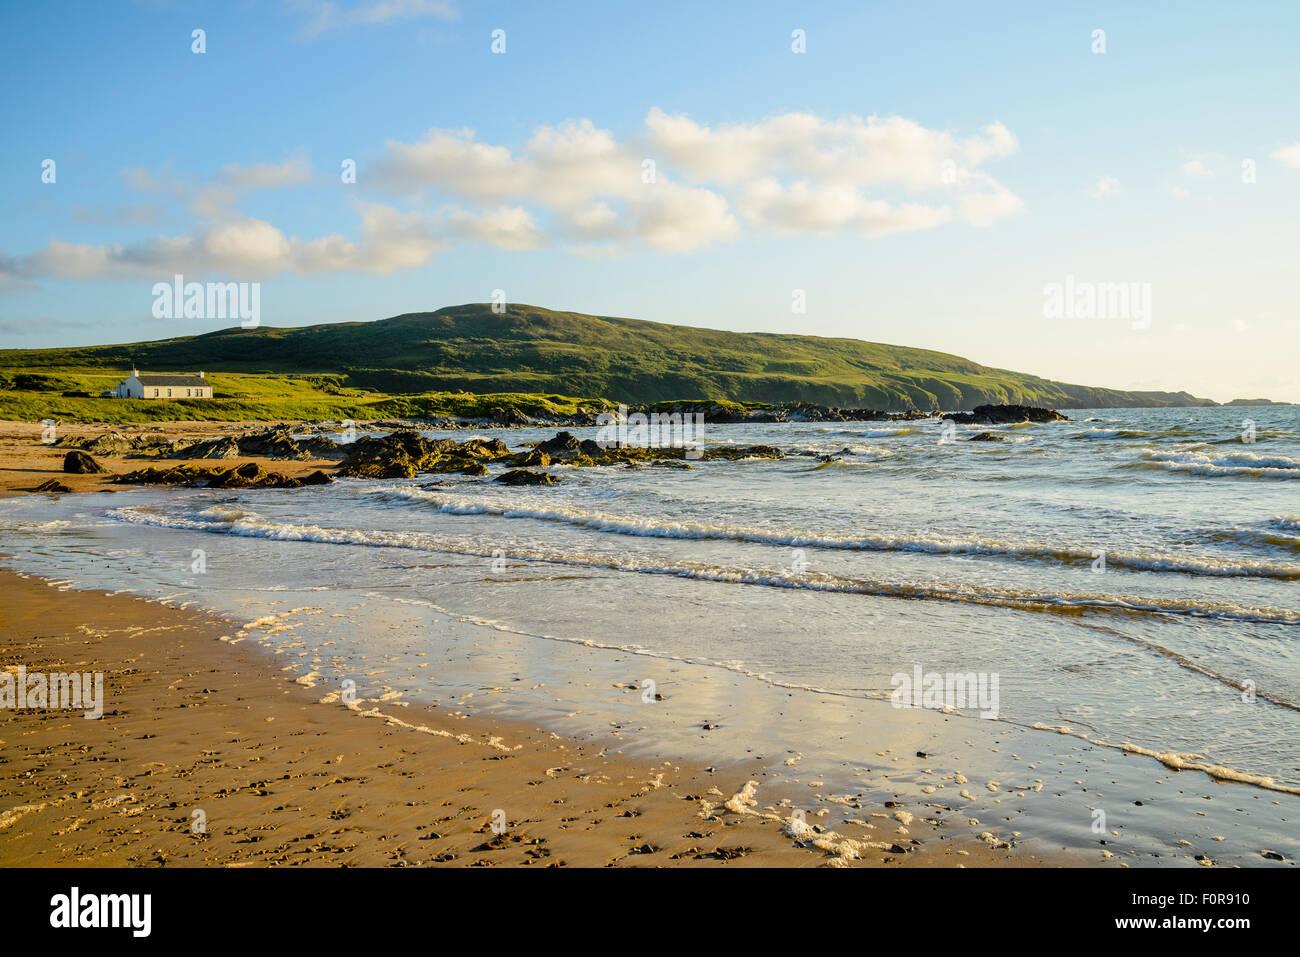 Beach at Laggan Bay on the island of Islay Scotland looking to The Oa - Stock Image